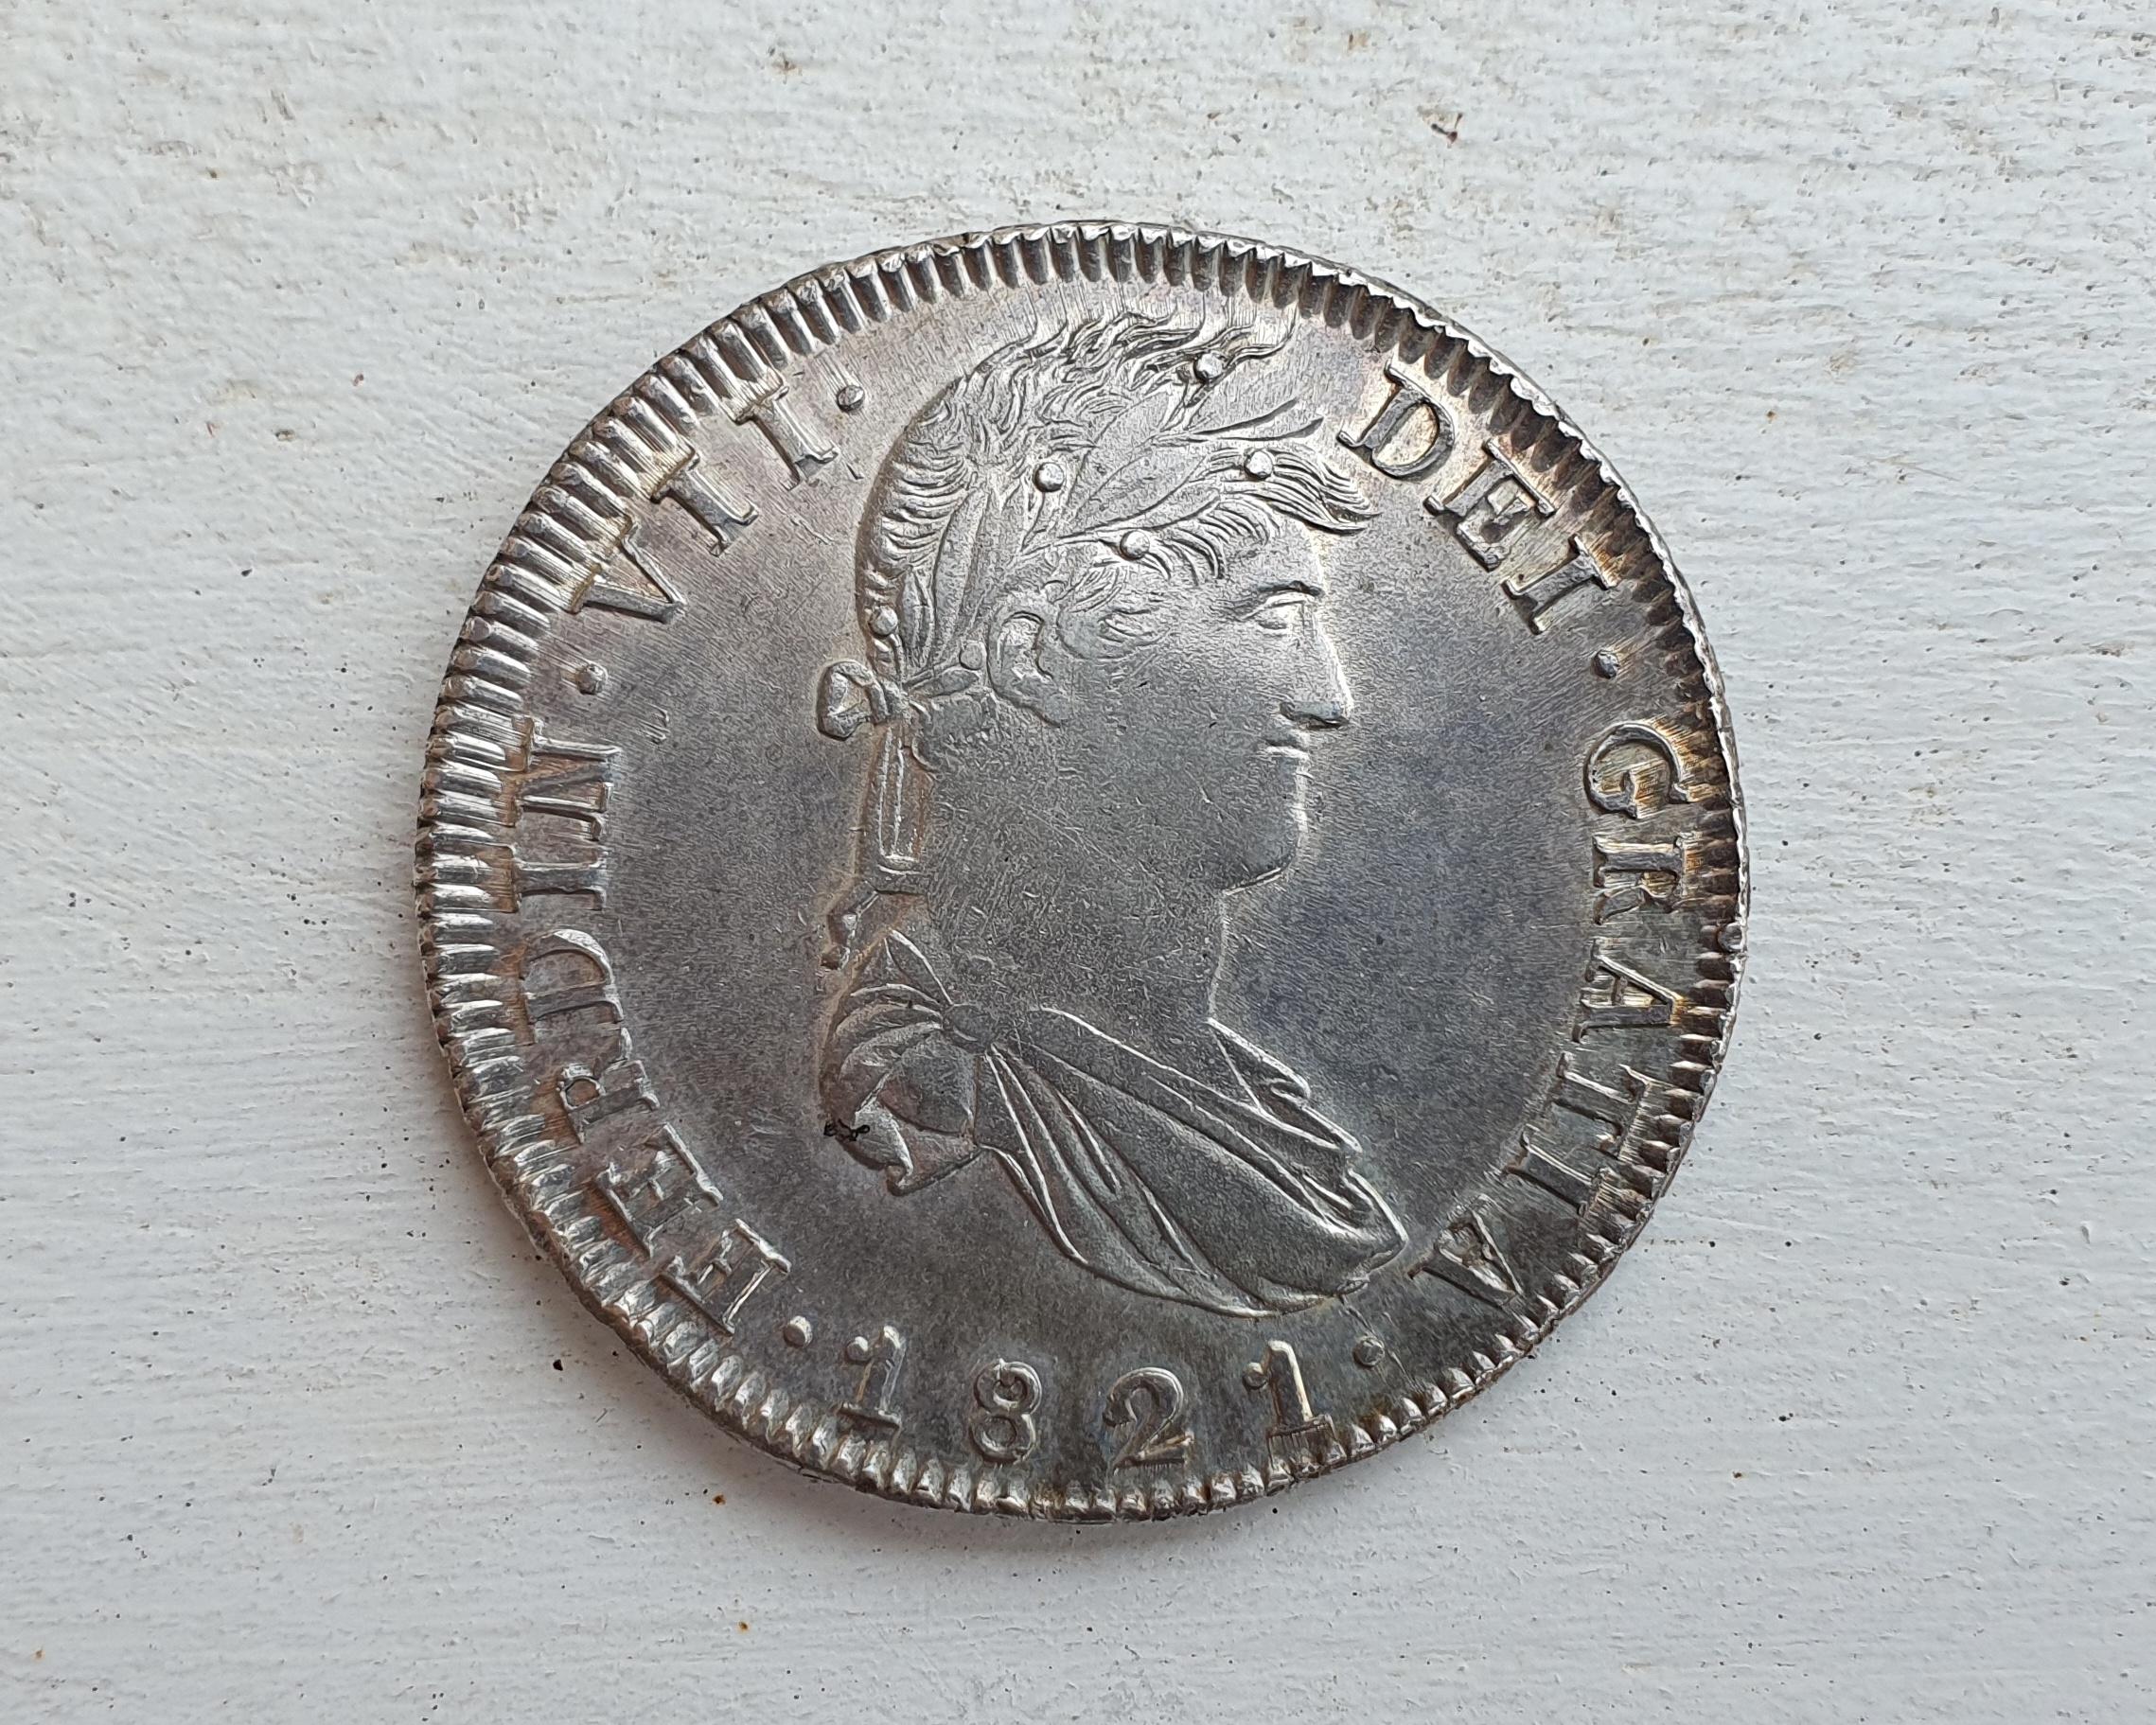 8 Reales Fernando VII 1821 Zacatecas 20201114-162630-Snapseed